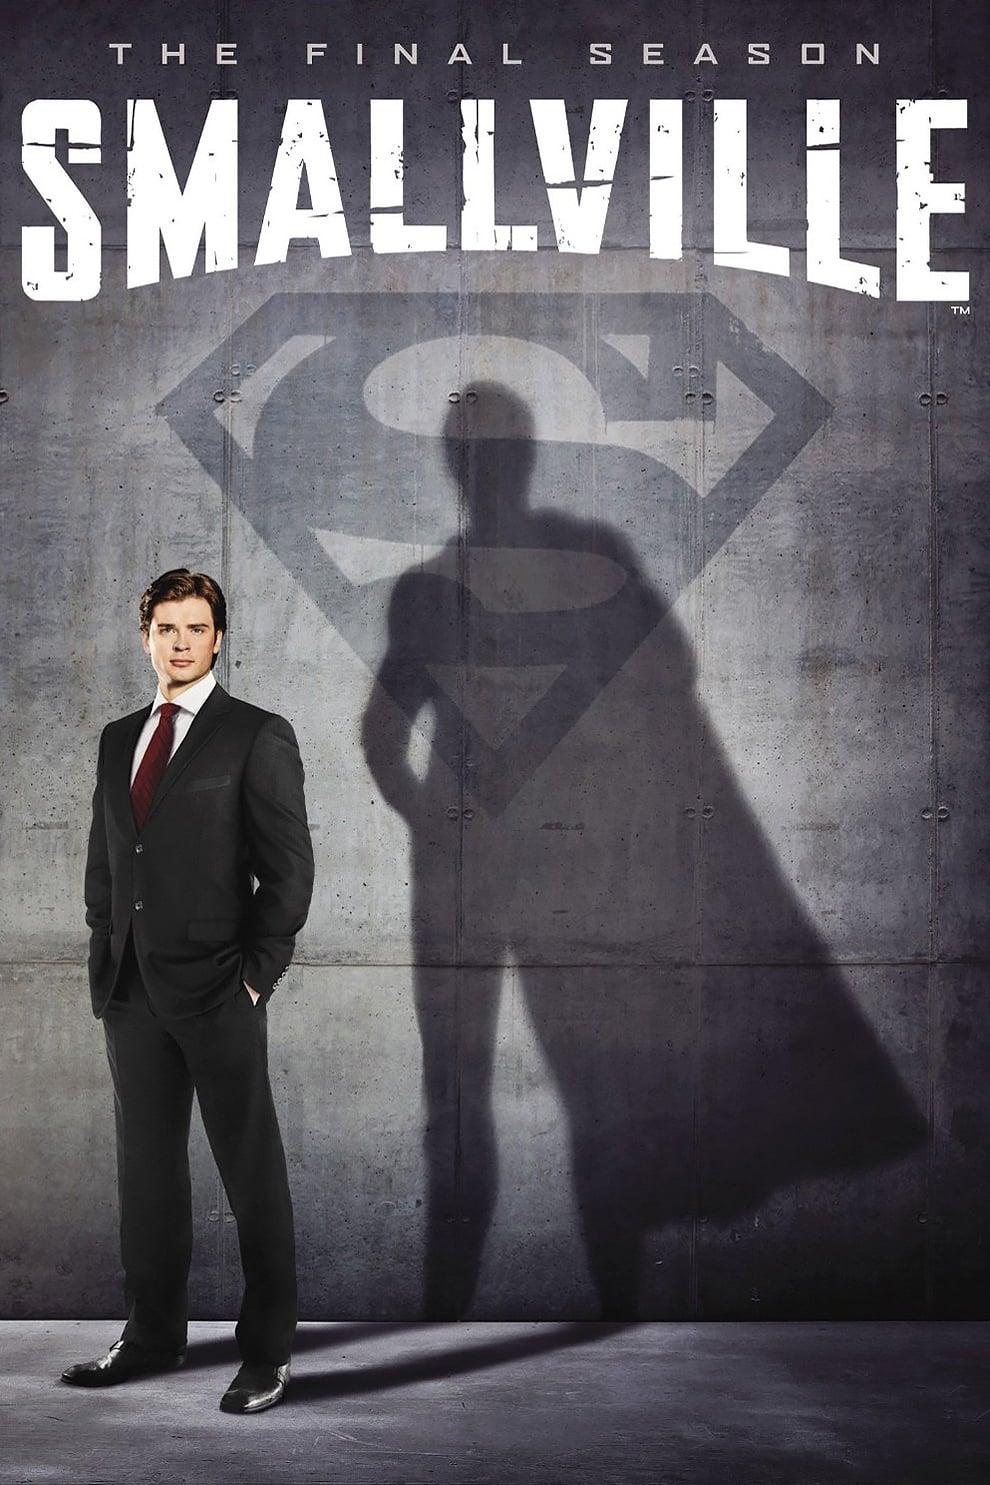 Smallville 10ª Temporada Dublado Torrent Downlaod Bluray 720p (2010)